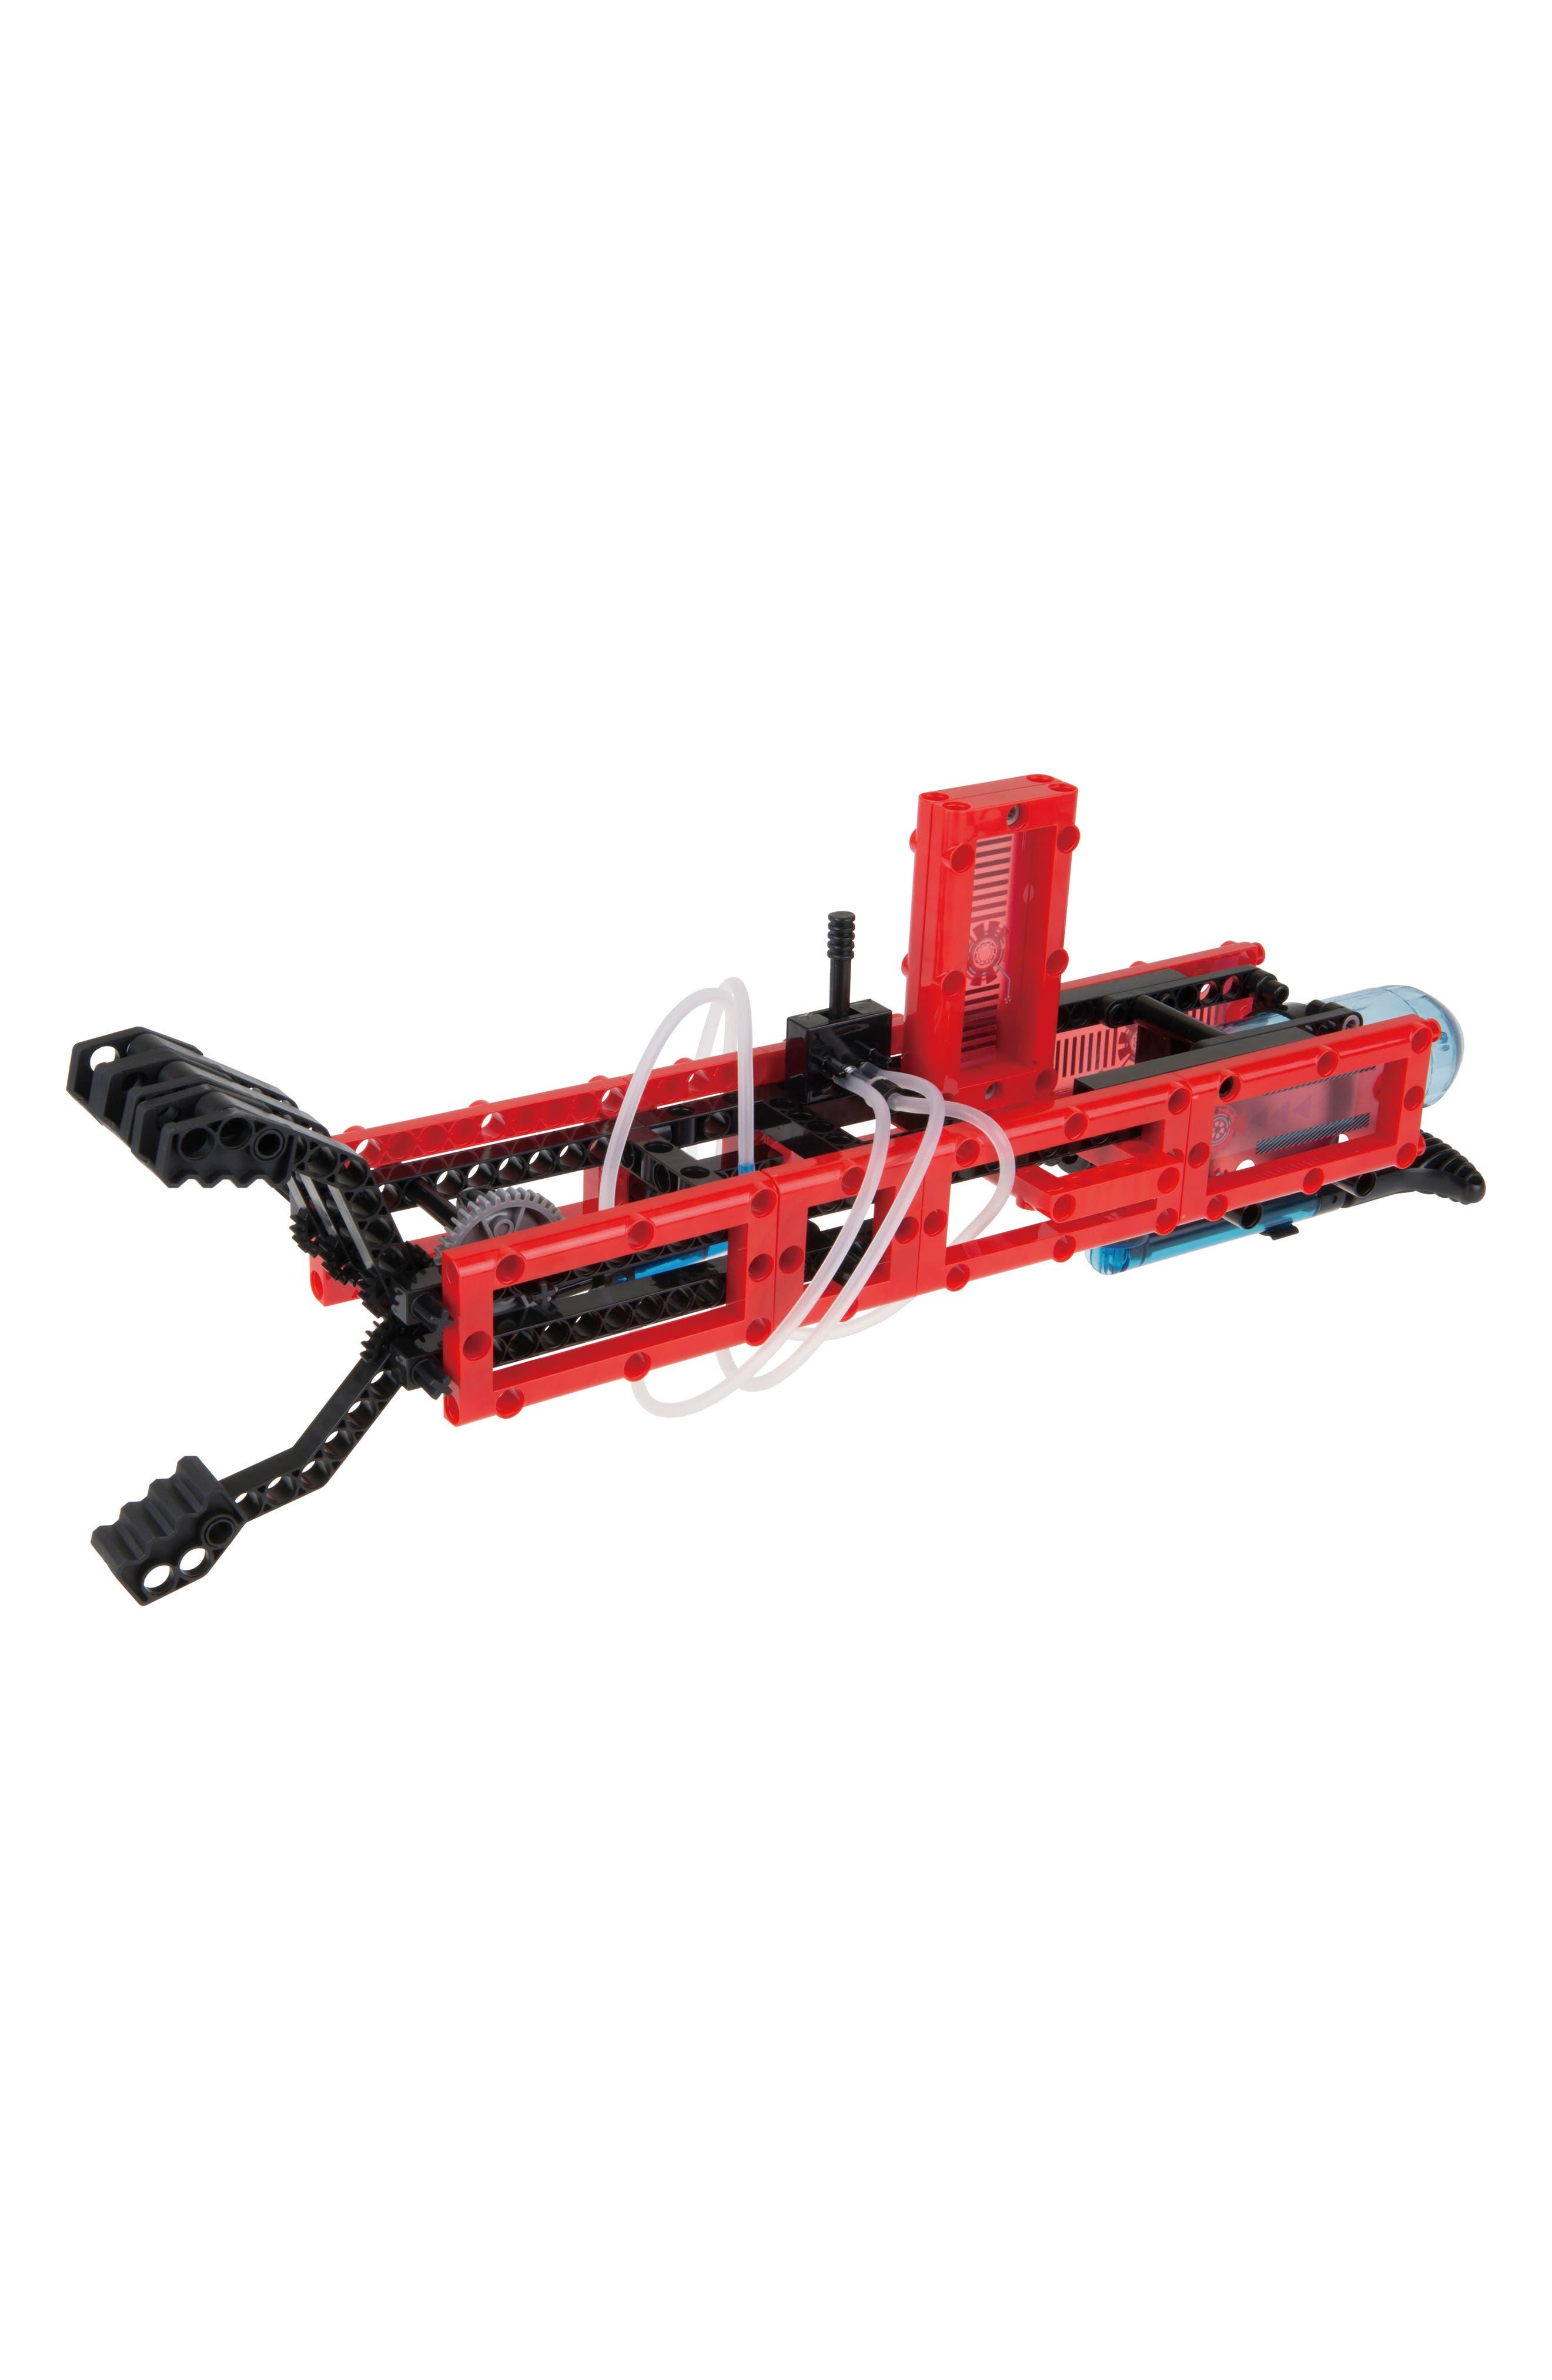 Mechanical Engineering Robotic Arms Kit,                             Alternate thumbnail 4, color,                             Multi